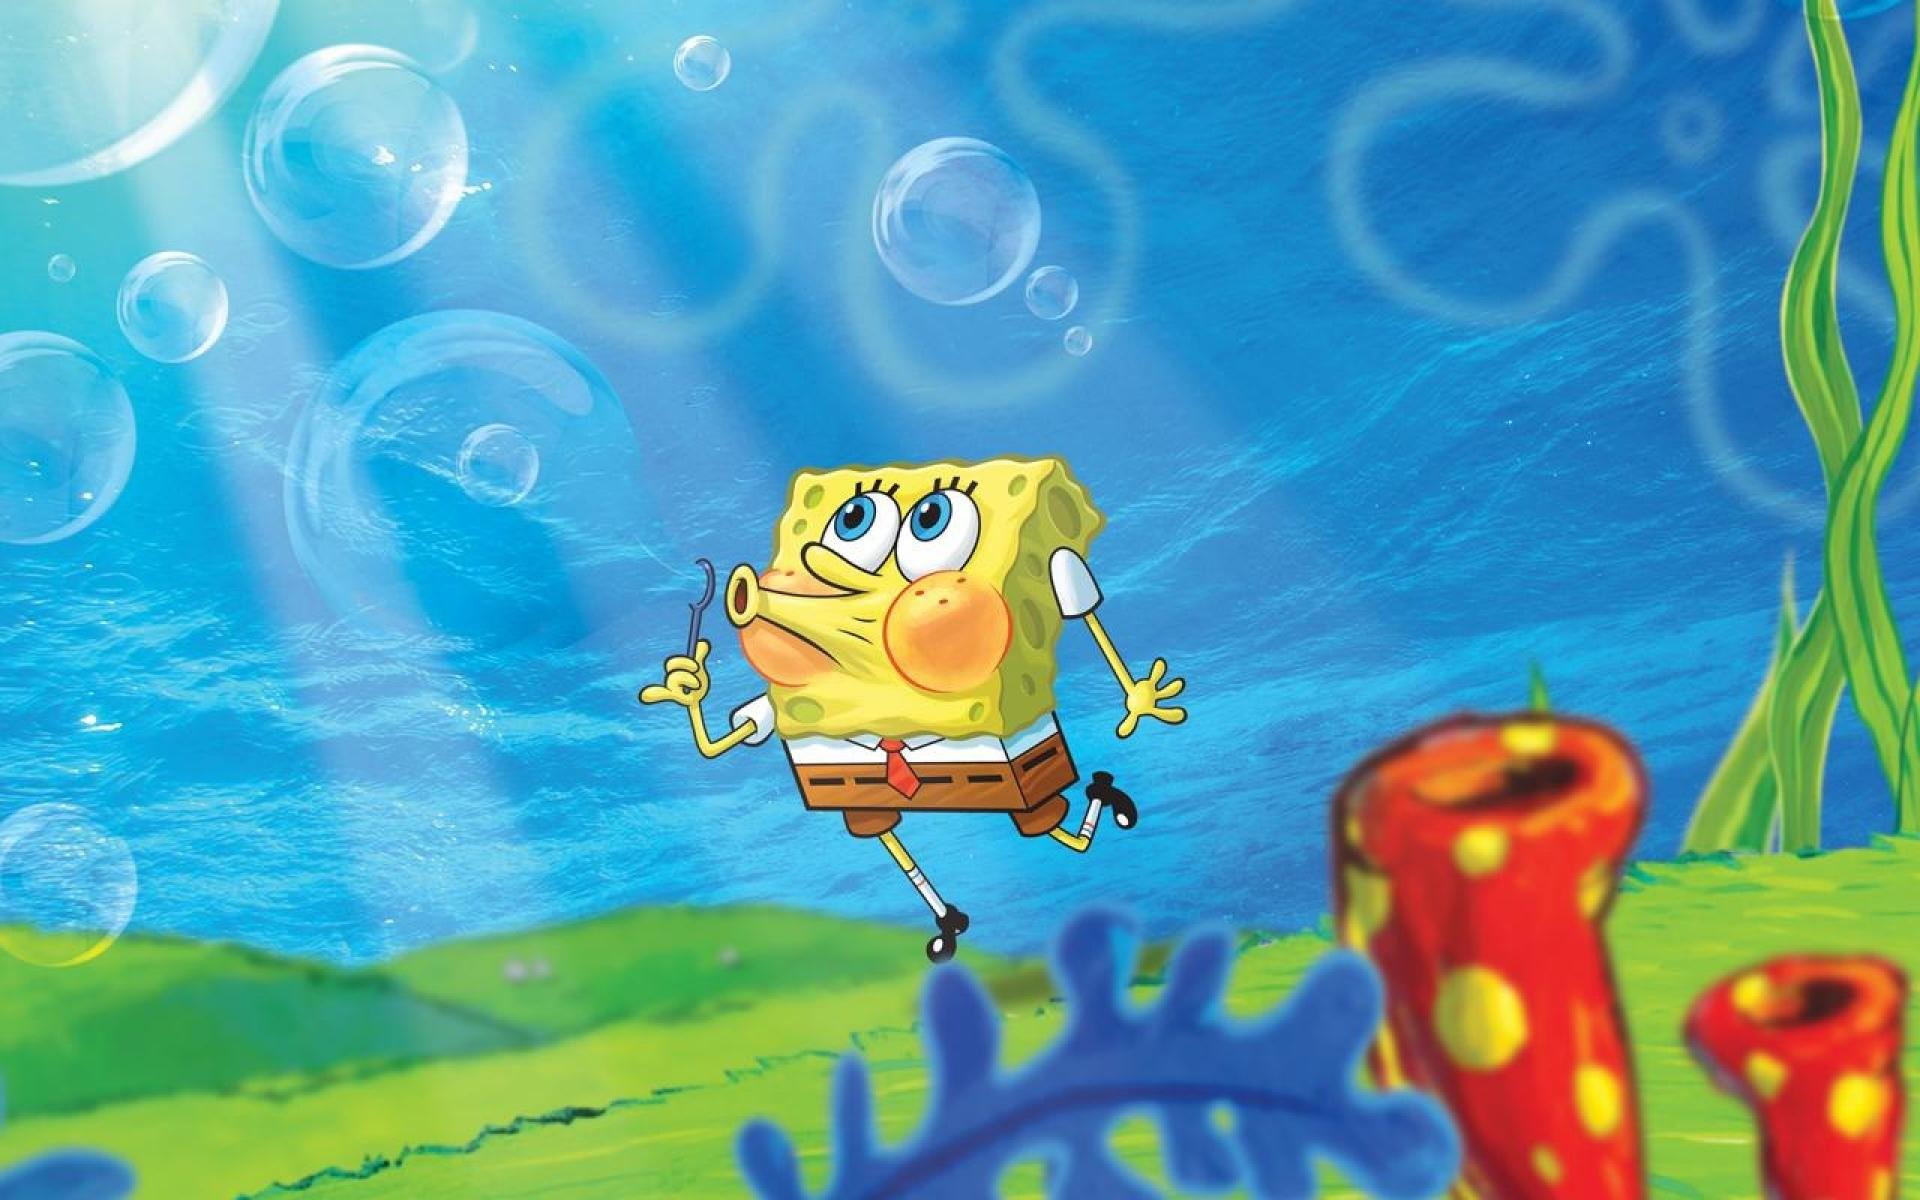 Full Screen Funny Spongebob Background